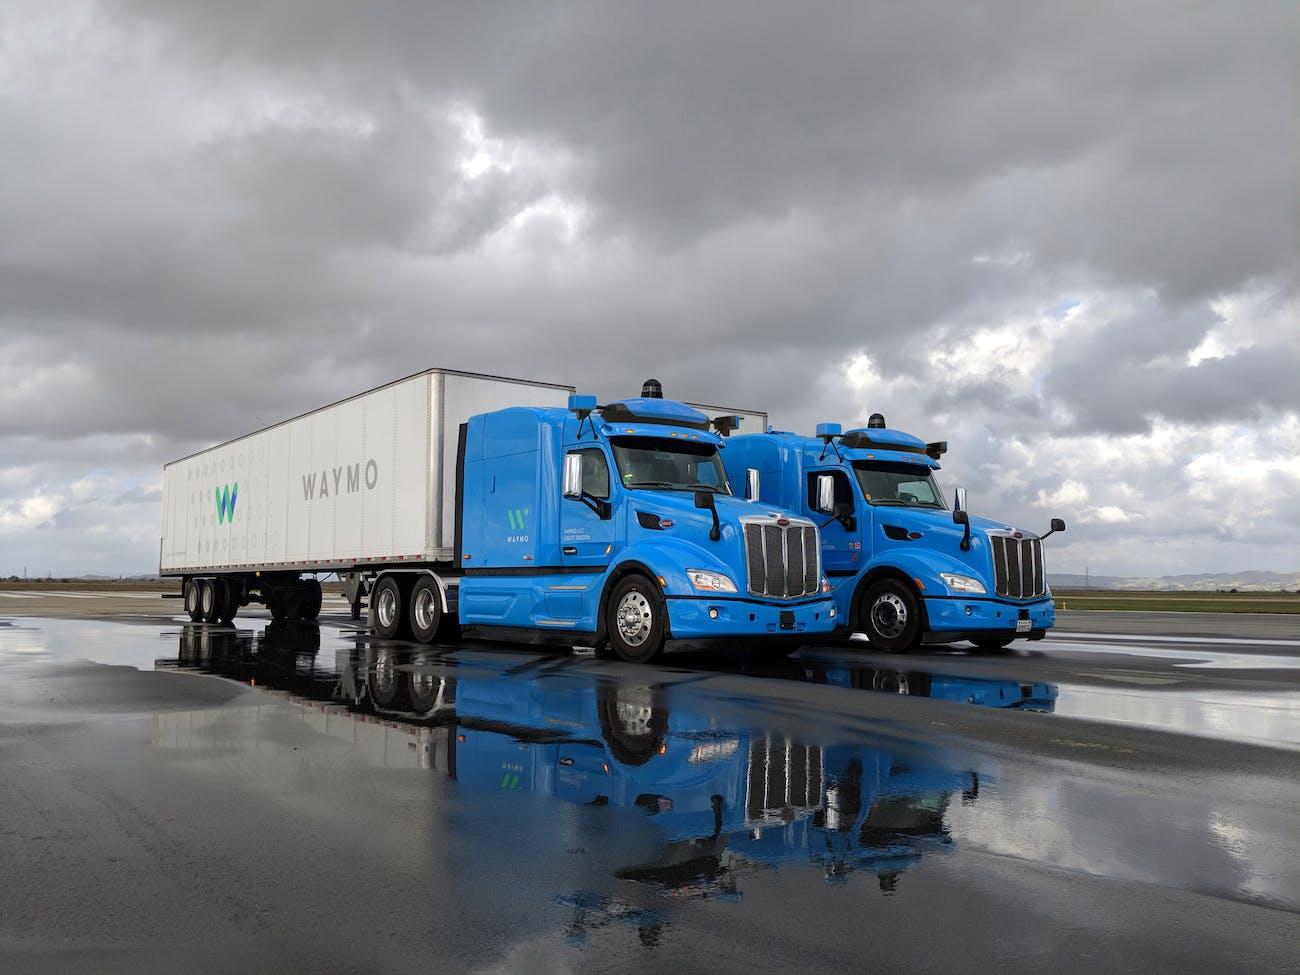 Waymo's autonomous trucks on the road.